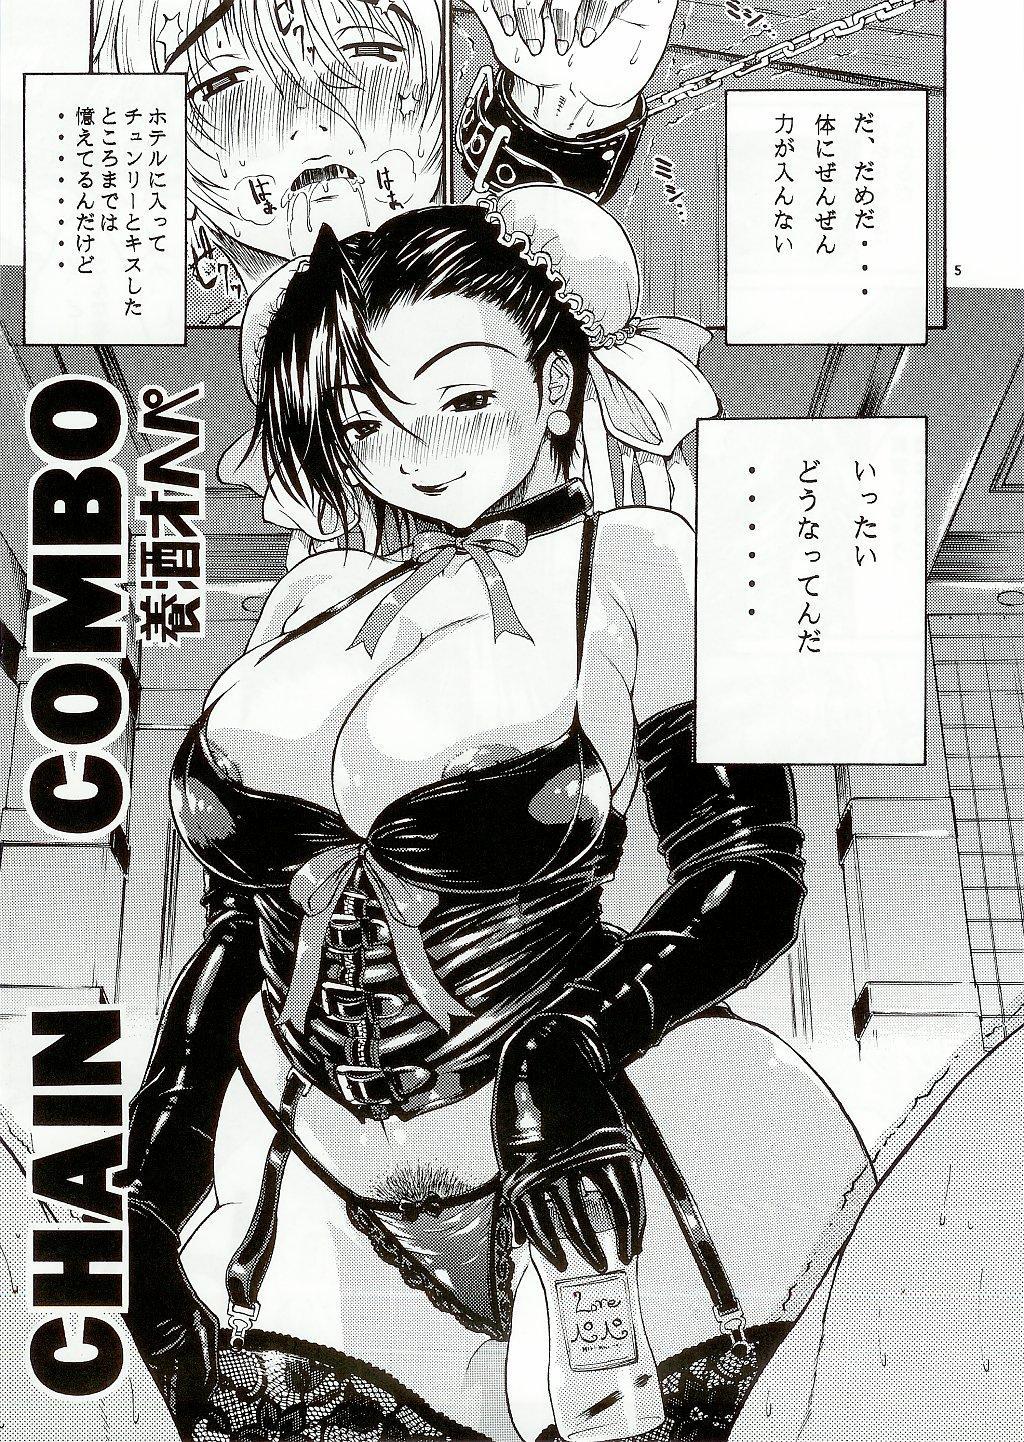 Thultwul Keikaku Vol. 3 4